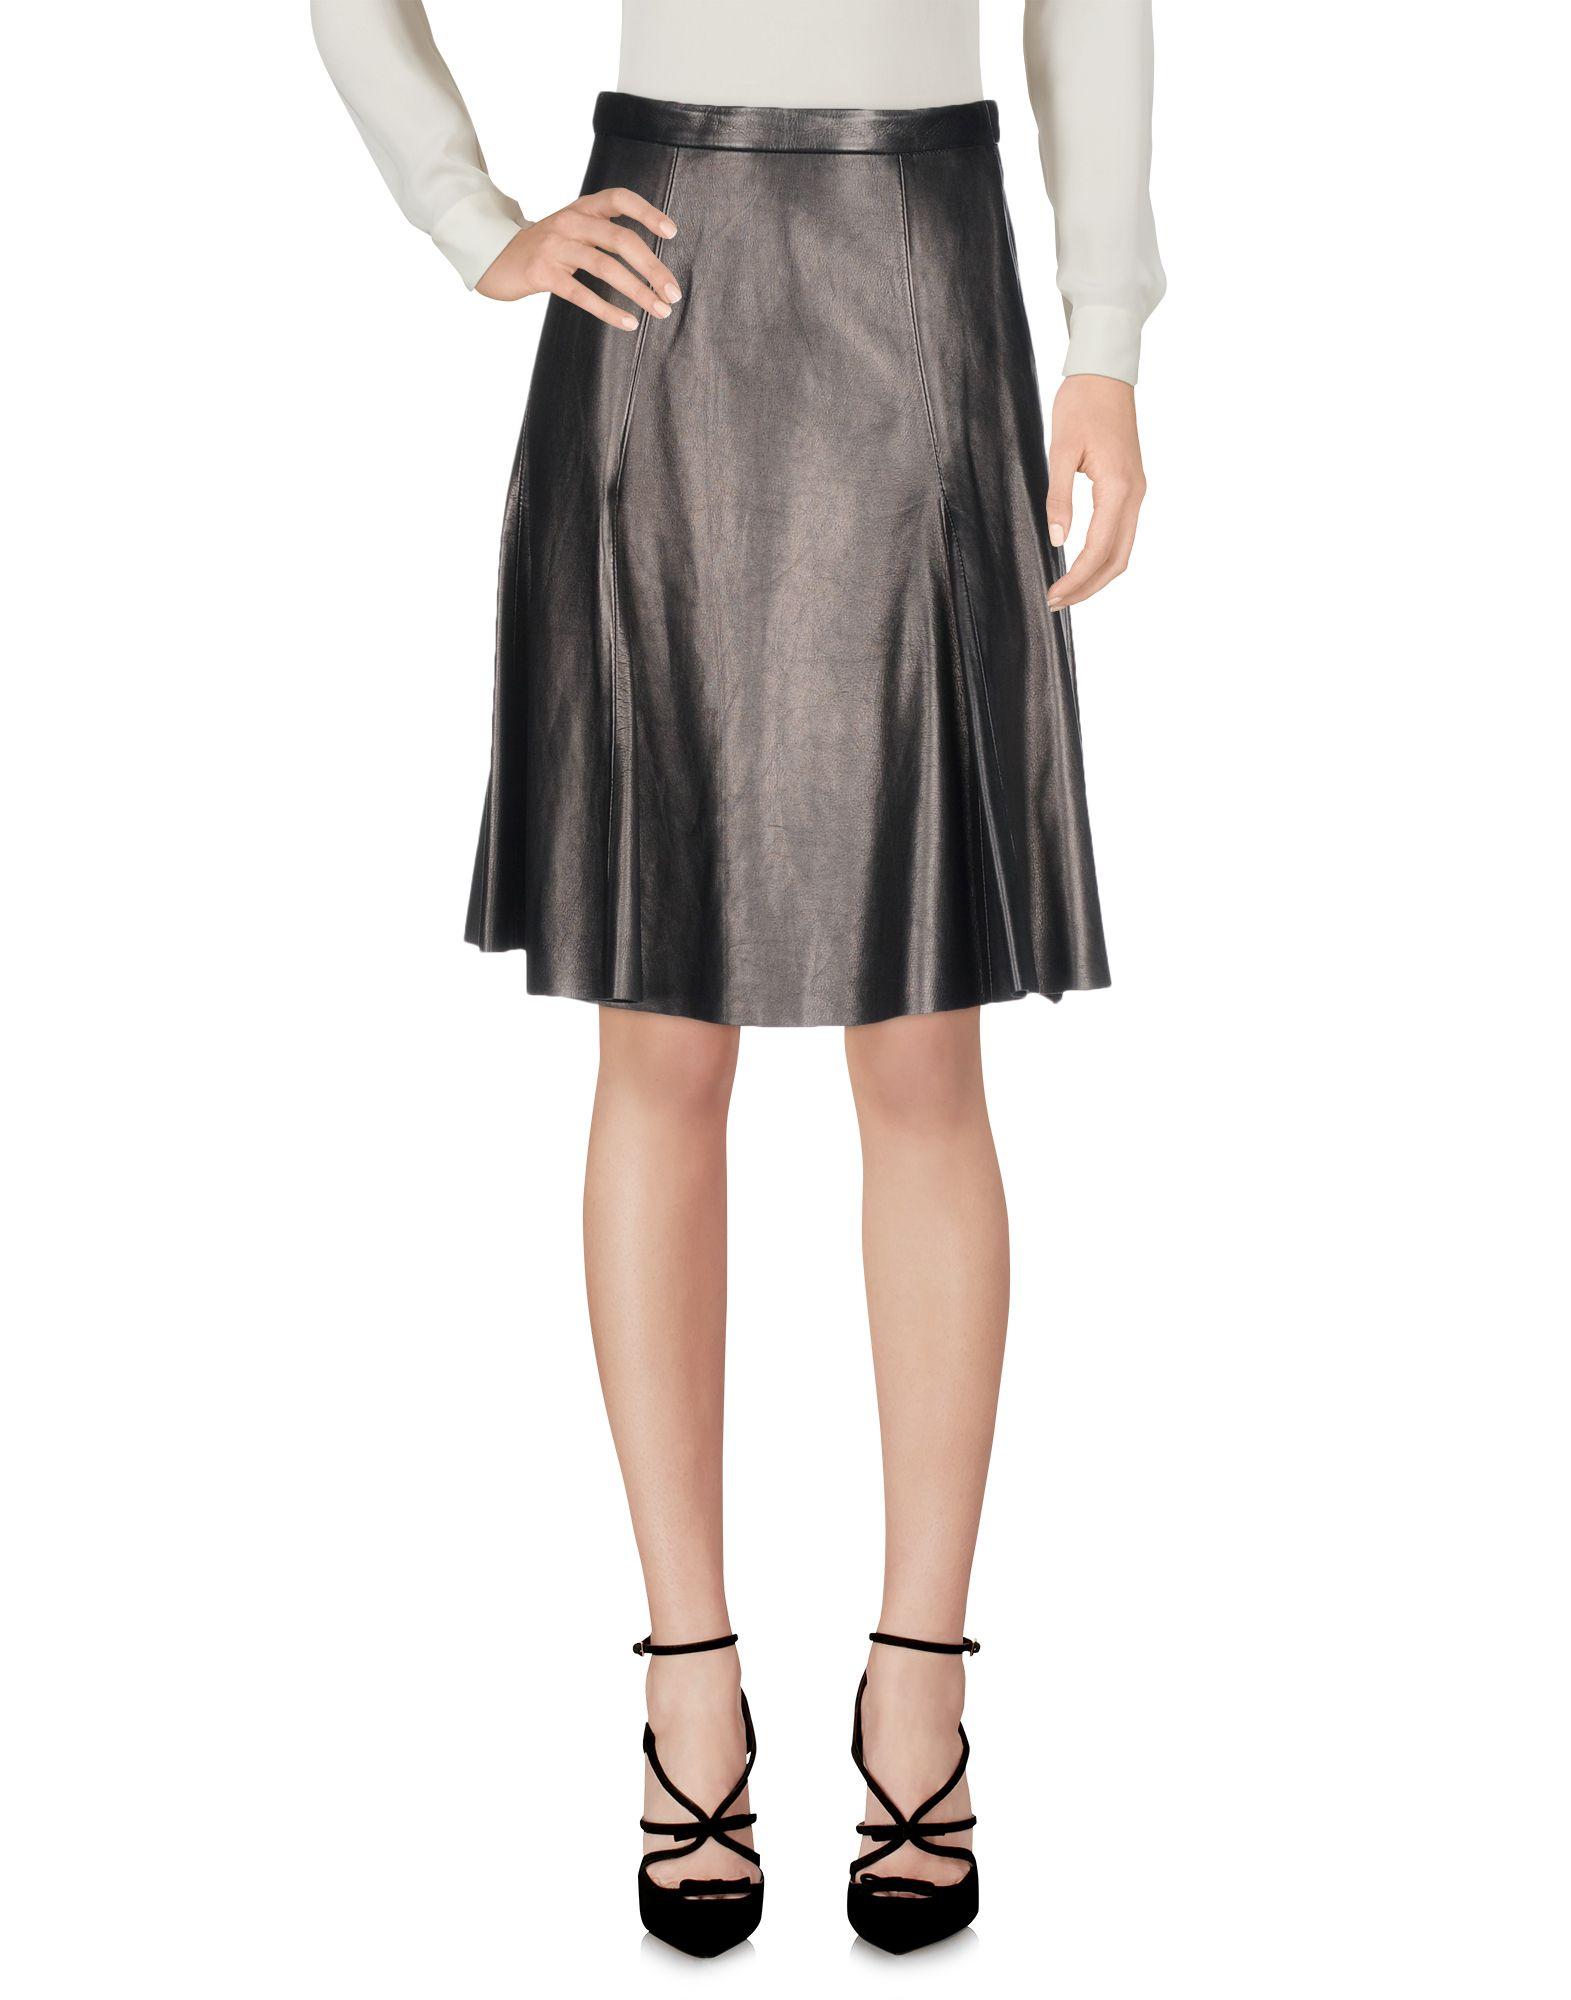 new style 4779c 60e1a グッチ(GUCCI) スカート | 通販・人気ランキング - 価格.com